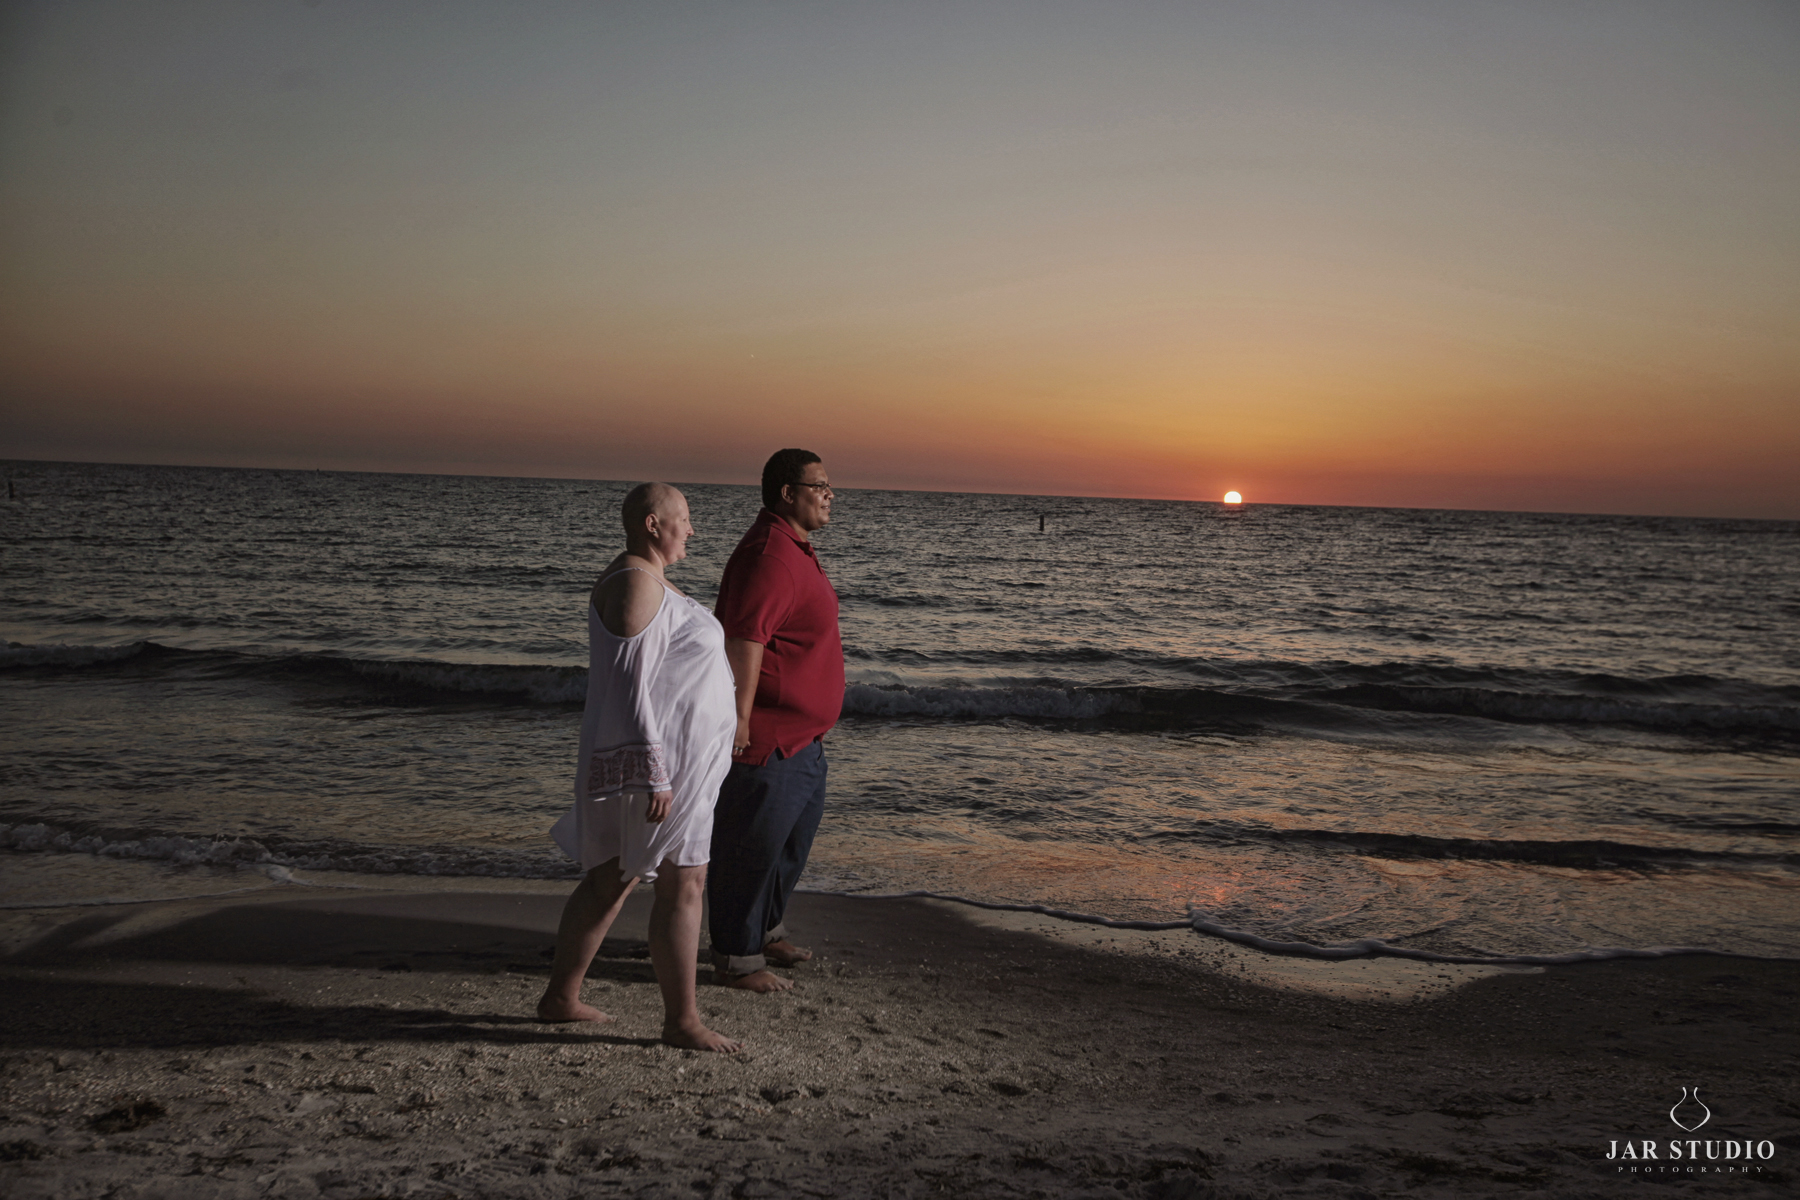 12-sun-down-romantic-photography-jarstudio.jpg